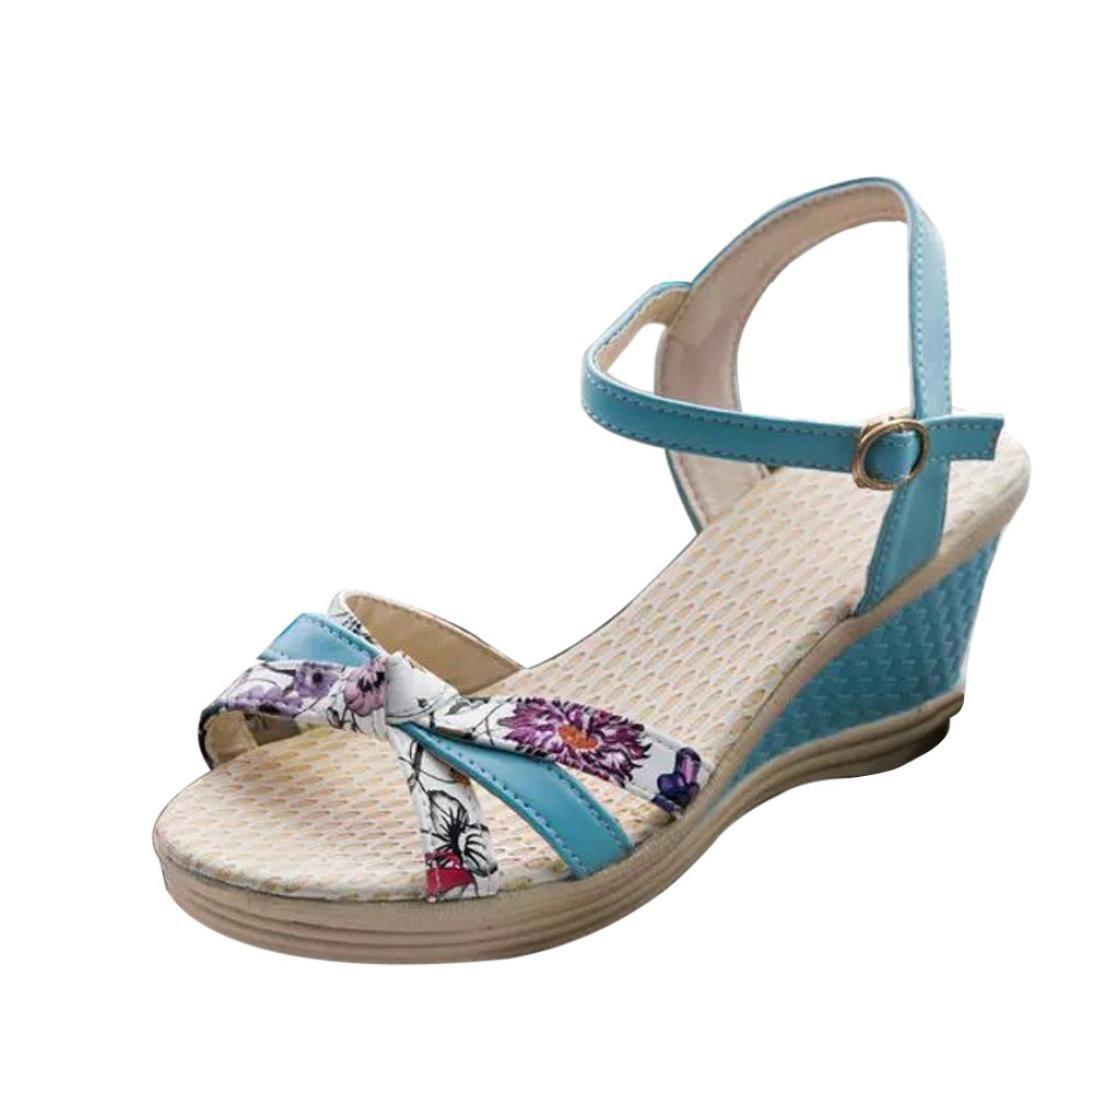 b24dca043d9 ❦❦❦Sole Material plastic---Women s Flip Flop Gladiator Flat Sandal  Fisherman Sandal Women s Elastic Flat Sandals Light Weight Adjustable  Outdoor Water ...